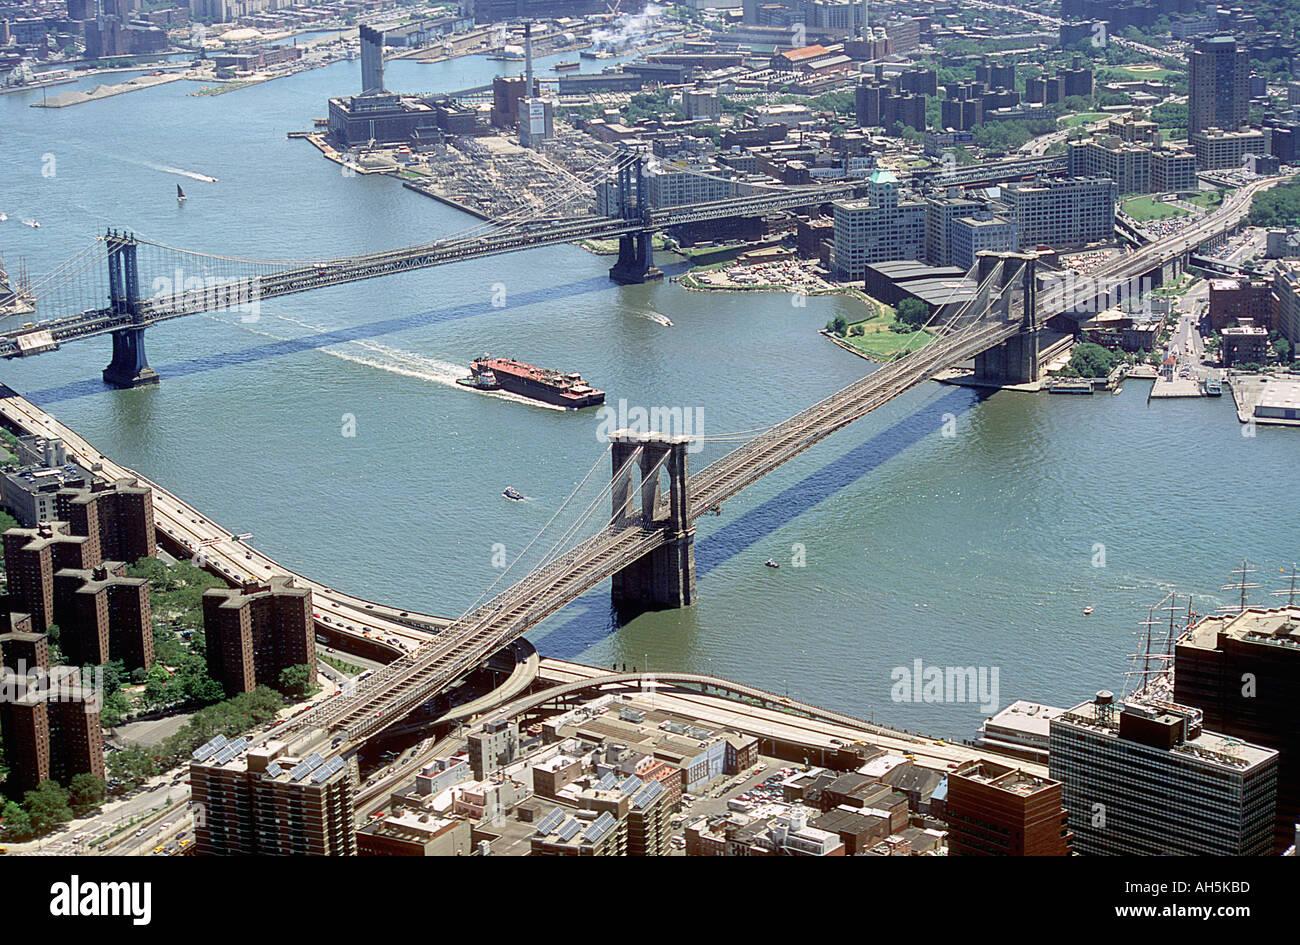 New York City East River Bridges Downtown Usa Stock Photo Alamy